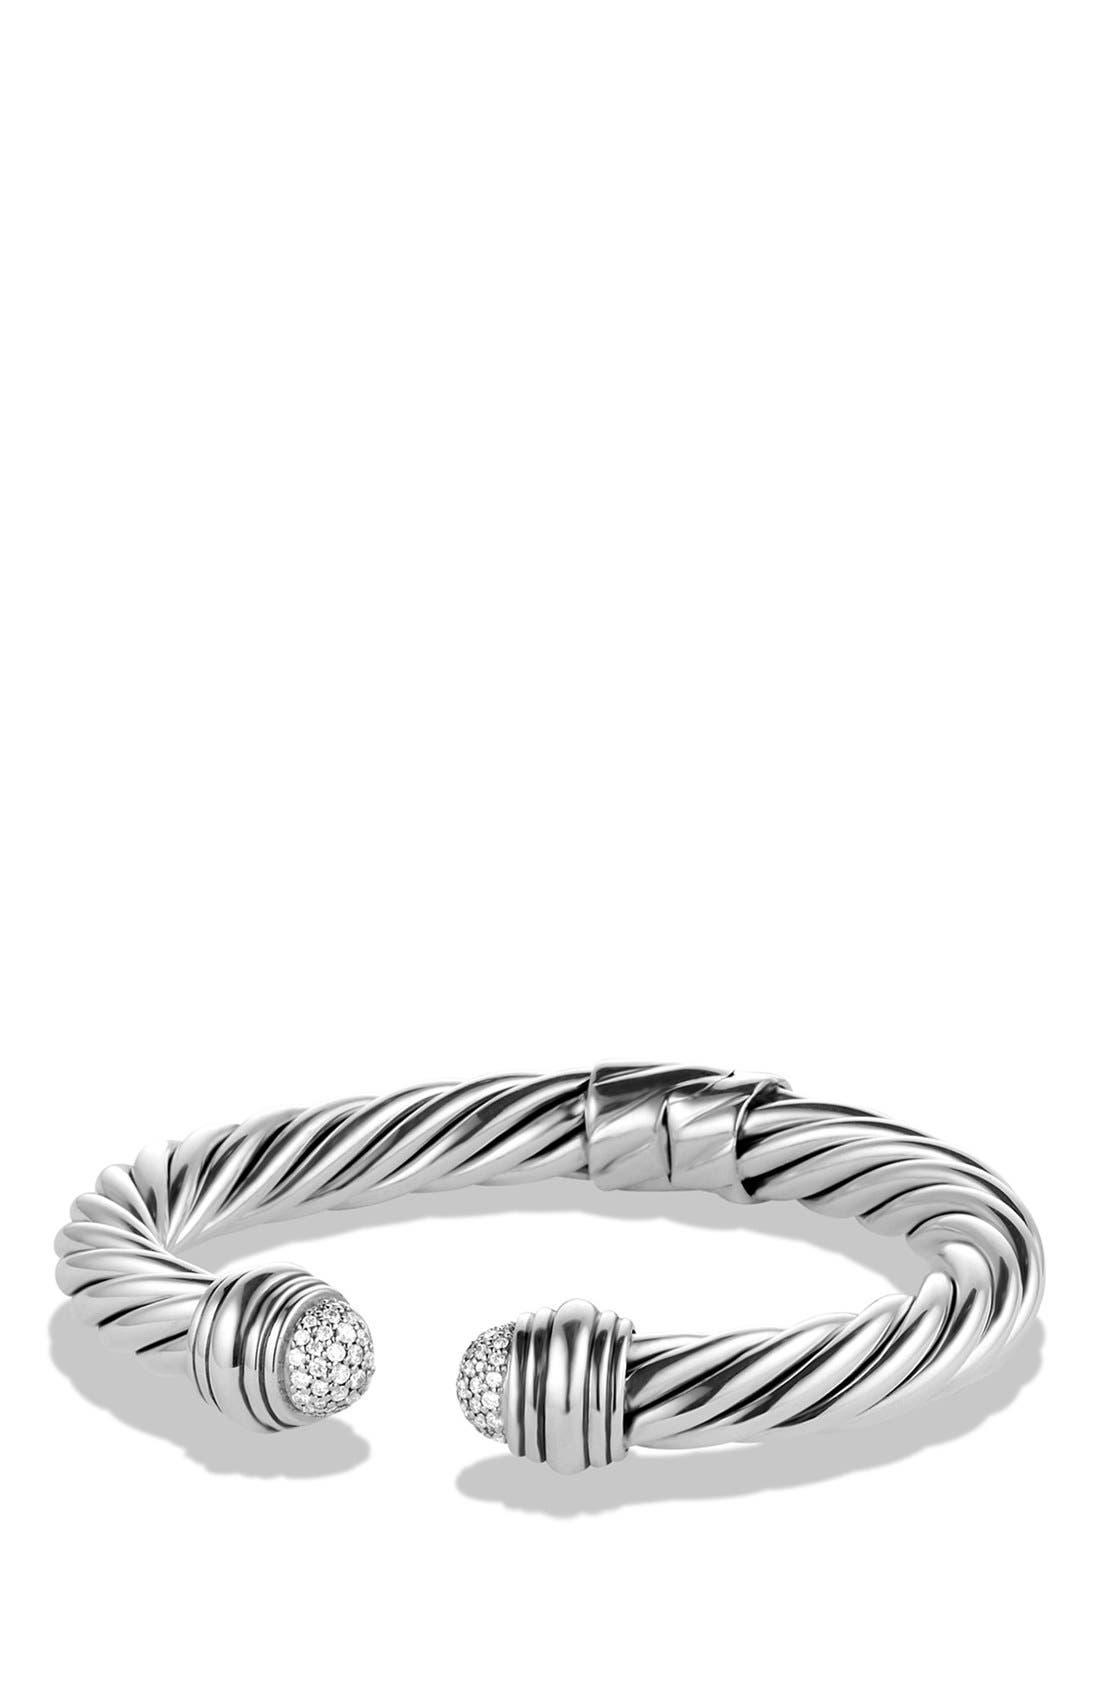 Alternate Image 1 Selected - David Yurman 'Cable Classics' Pavé Tip Bracelet with Diamonds